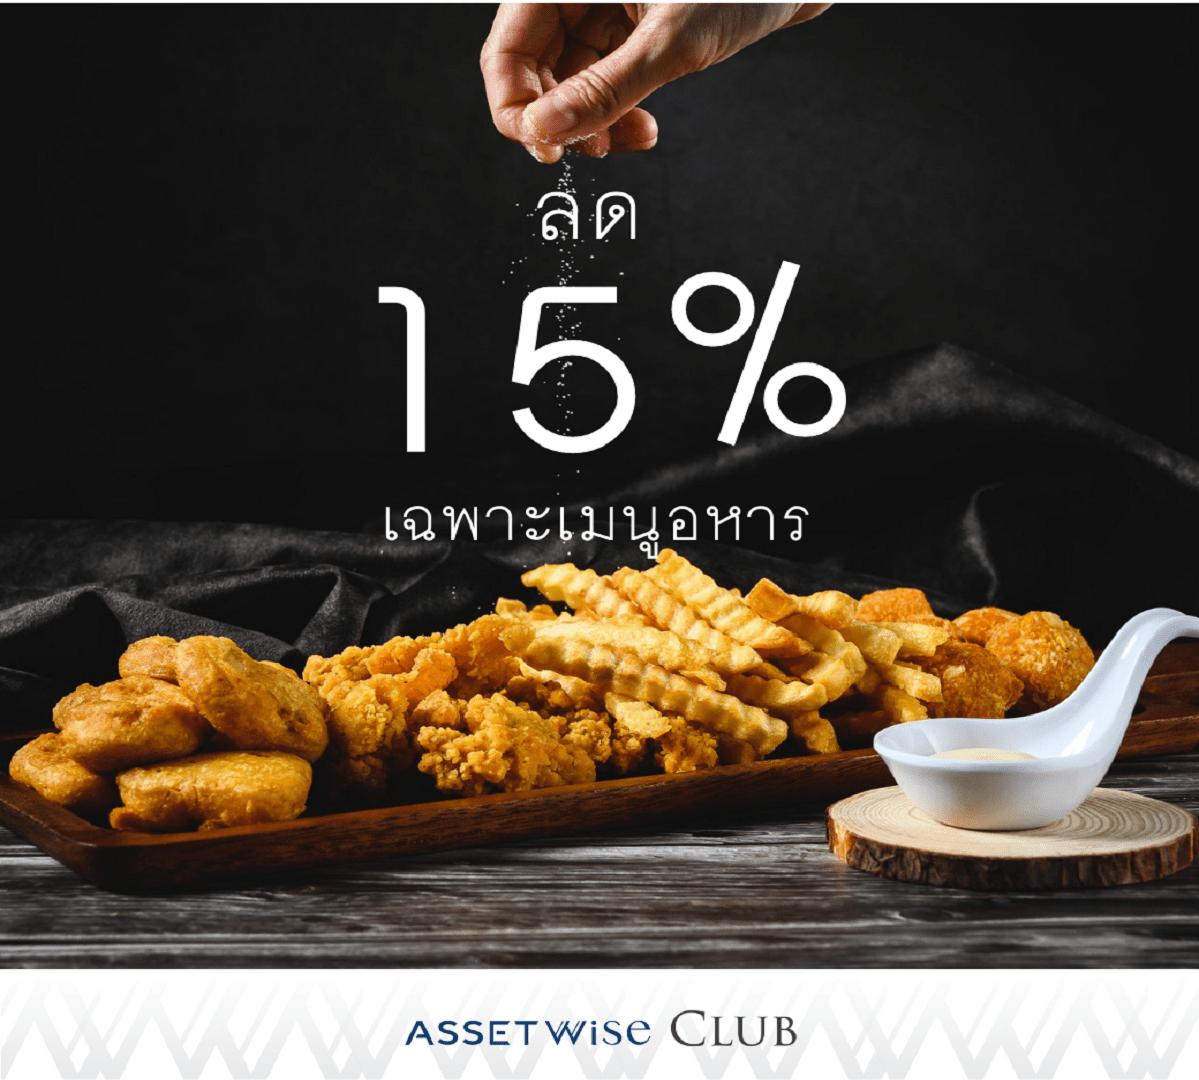 ASAP Food & Drink มอบส่วนลดพิเศษให้กับ AssetWise Club